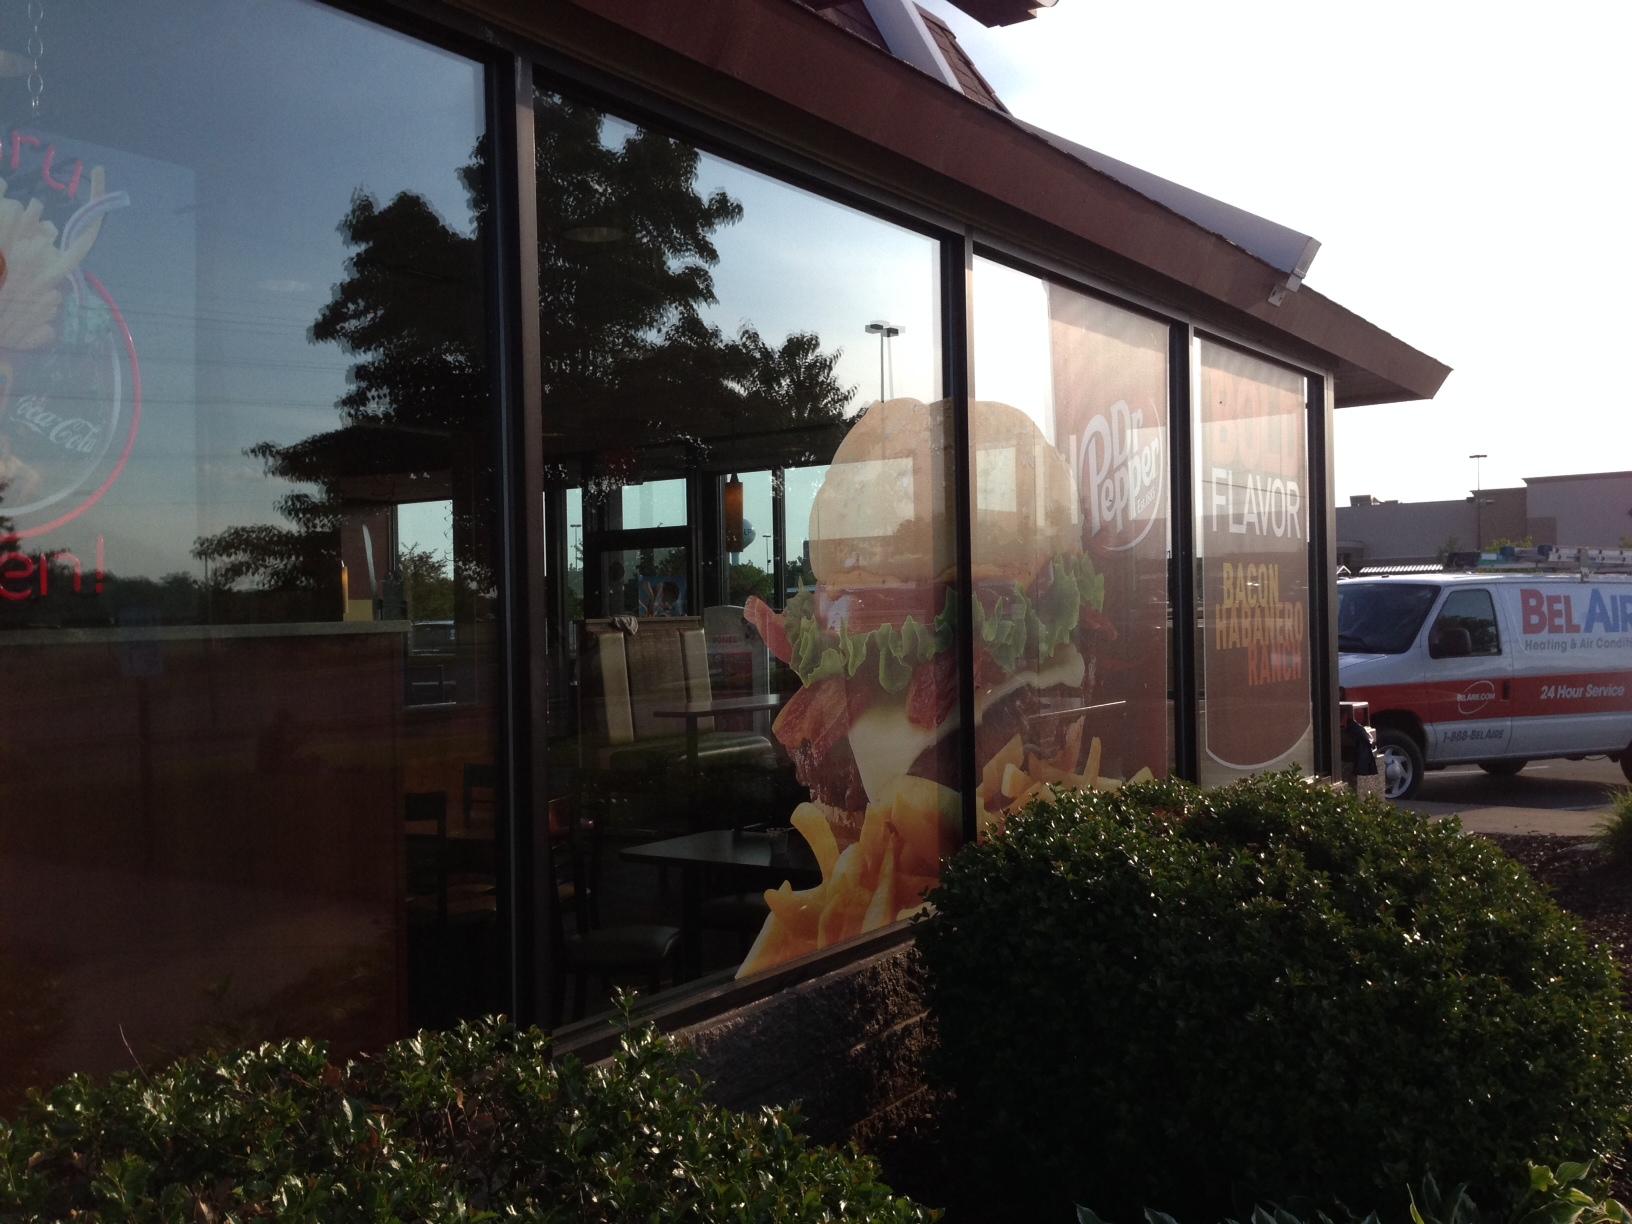 McDonalds store front signage.